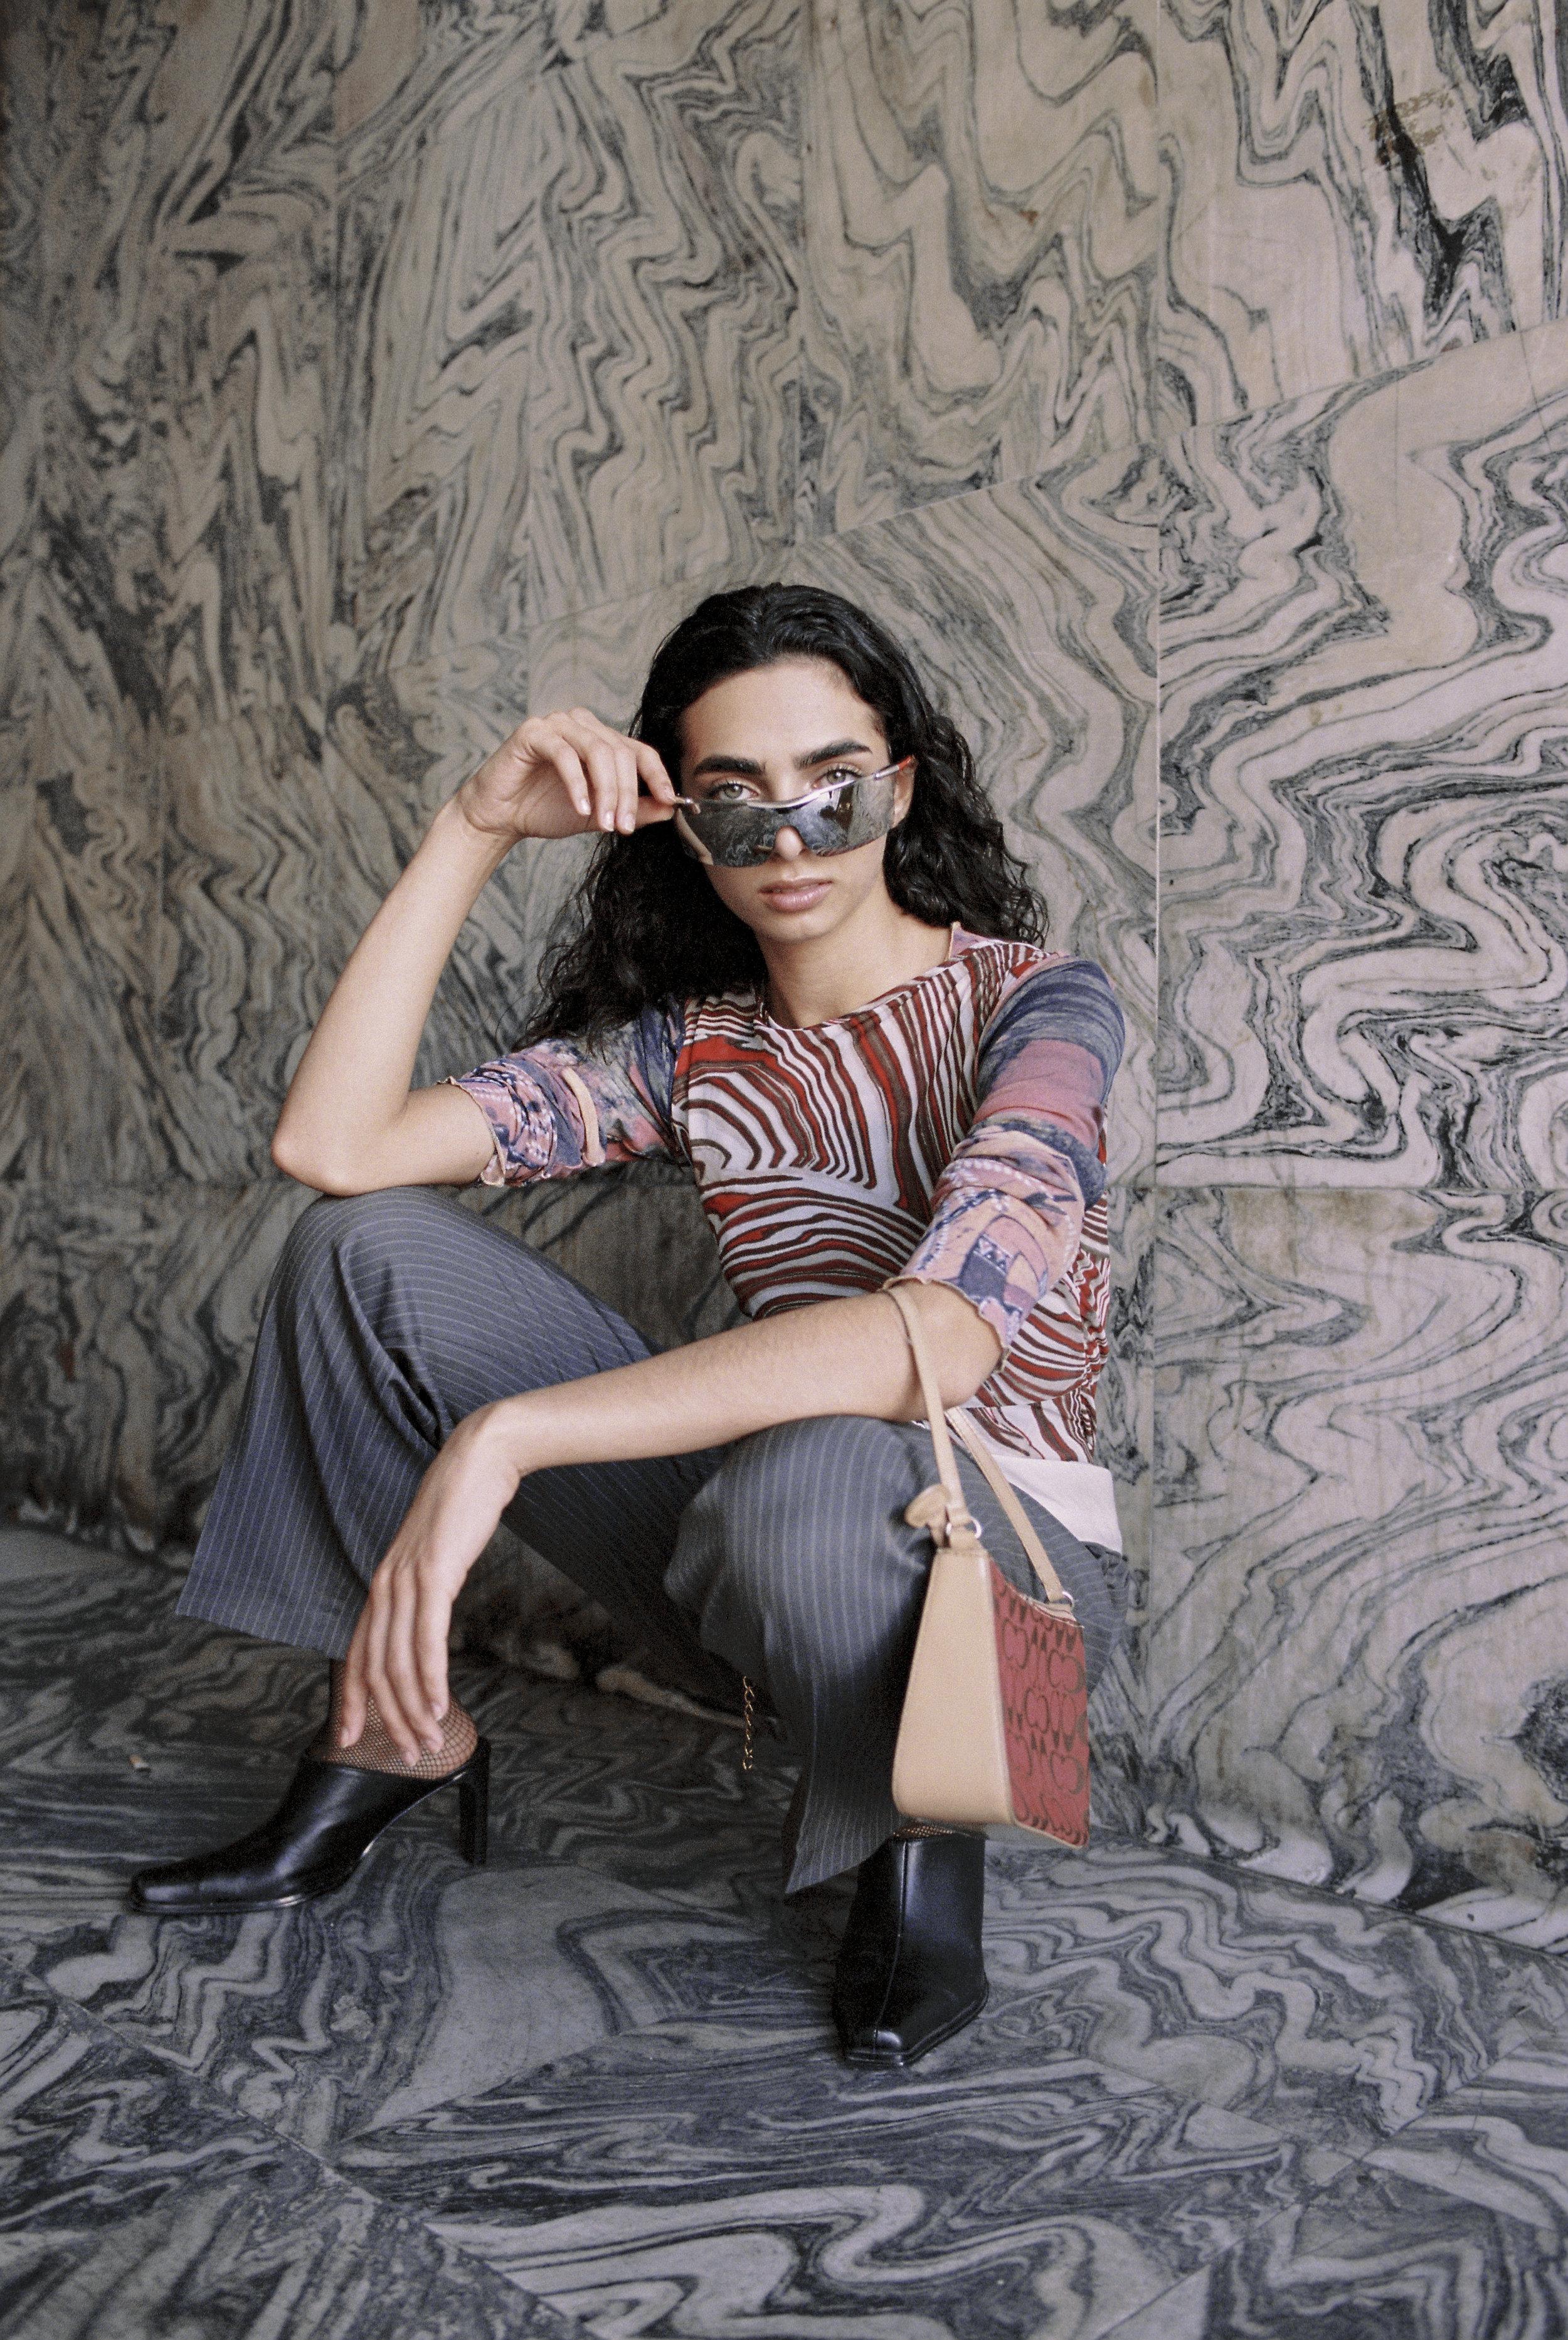 sunglasses Prada, top Mexx, bag Coach